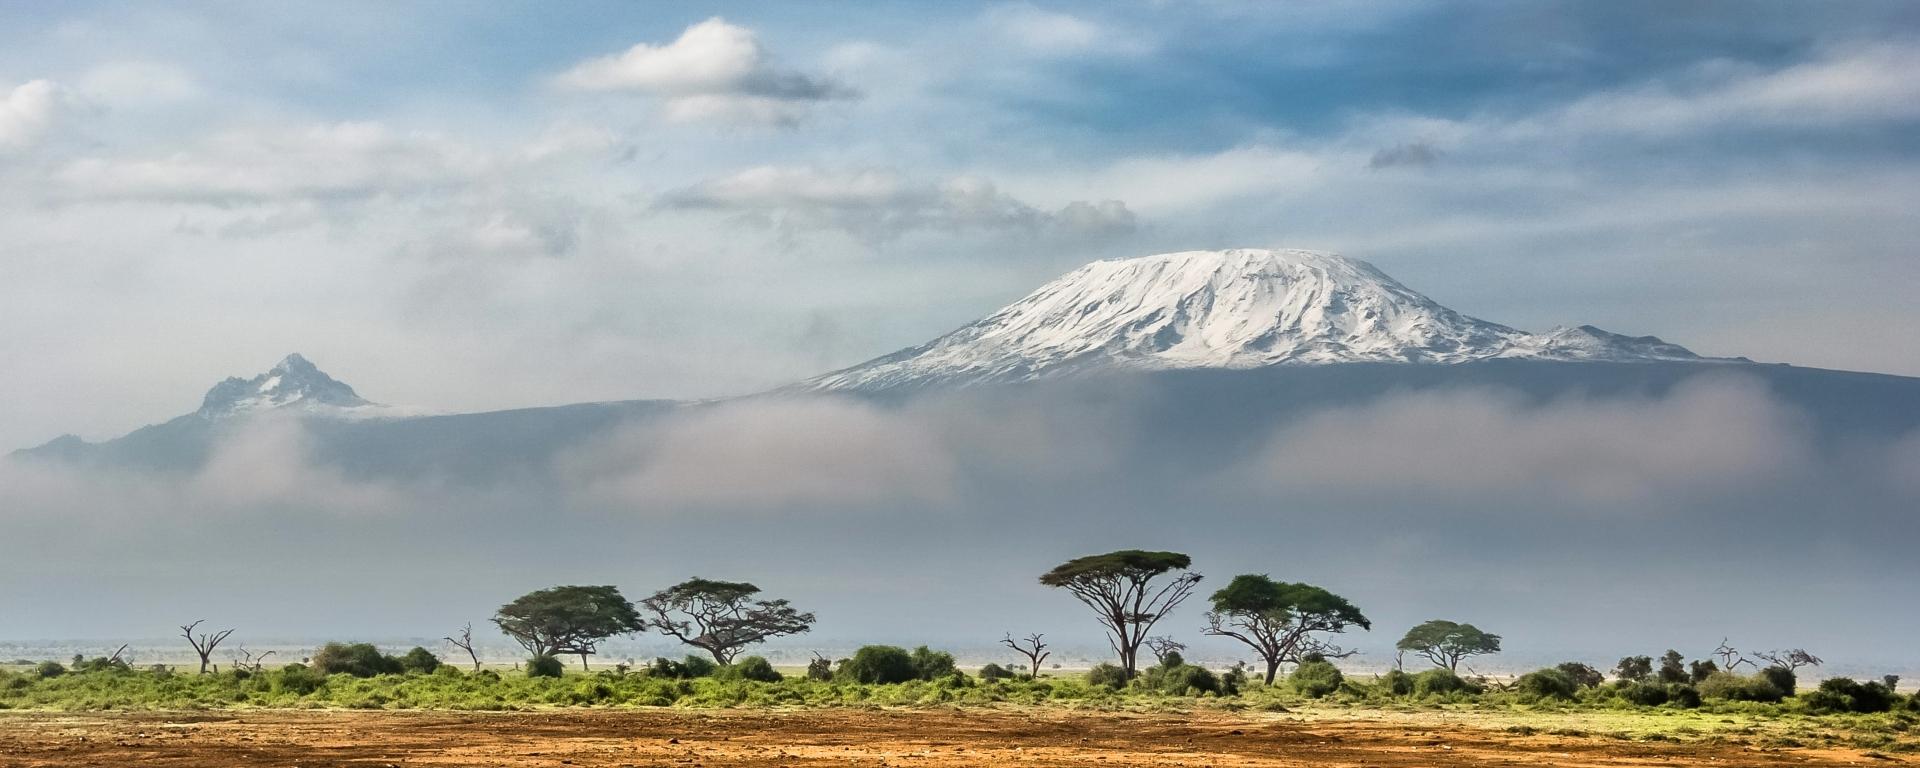 Kilimanjaro_Go2Africa_banner